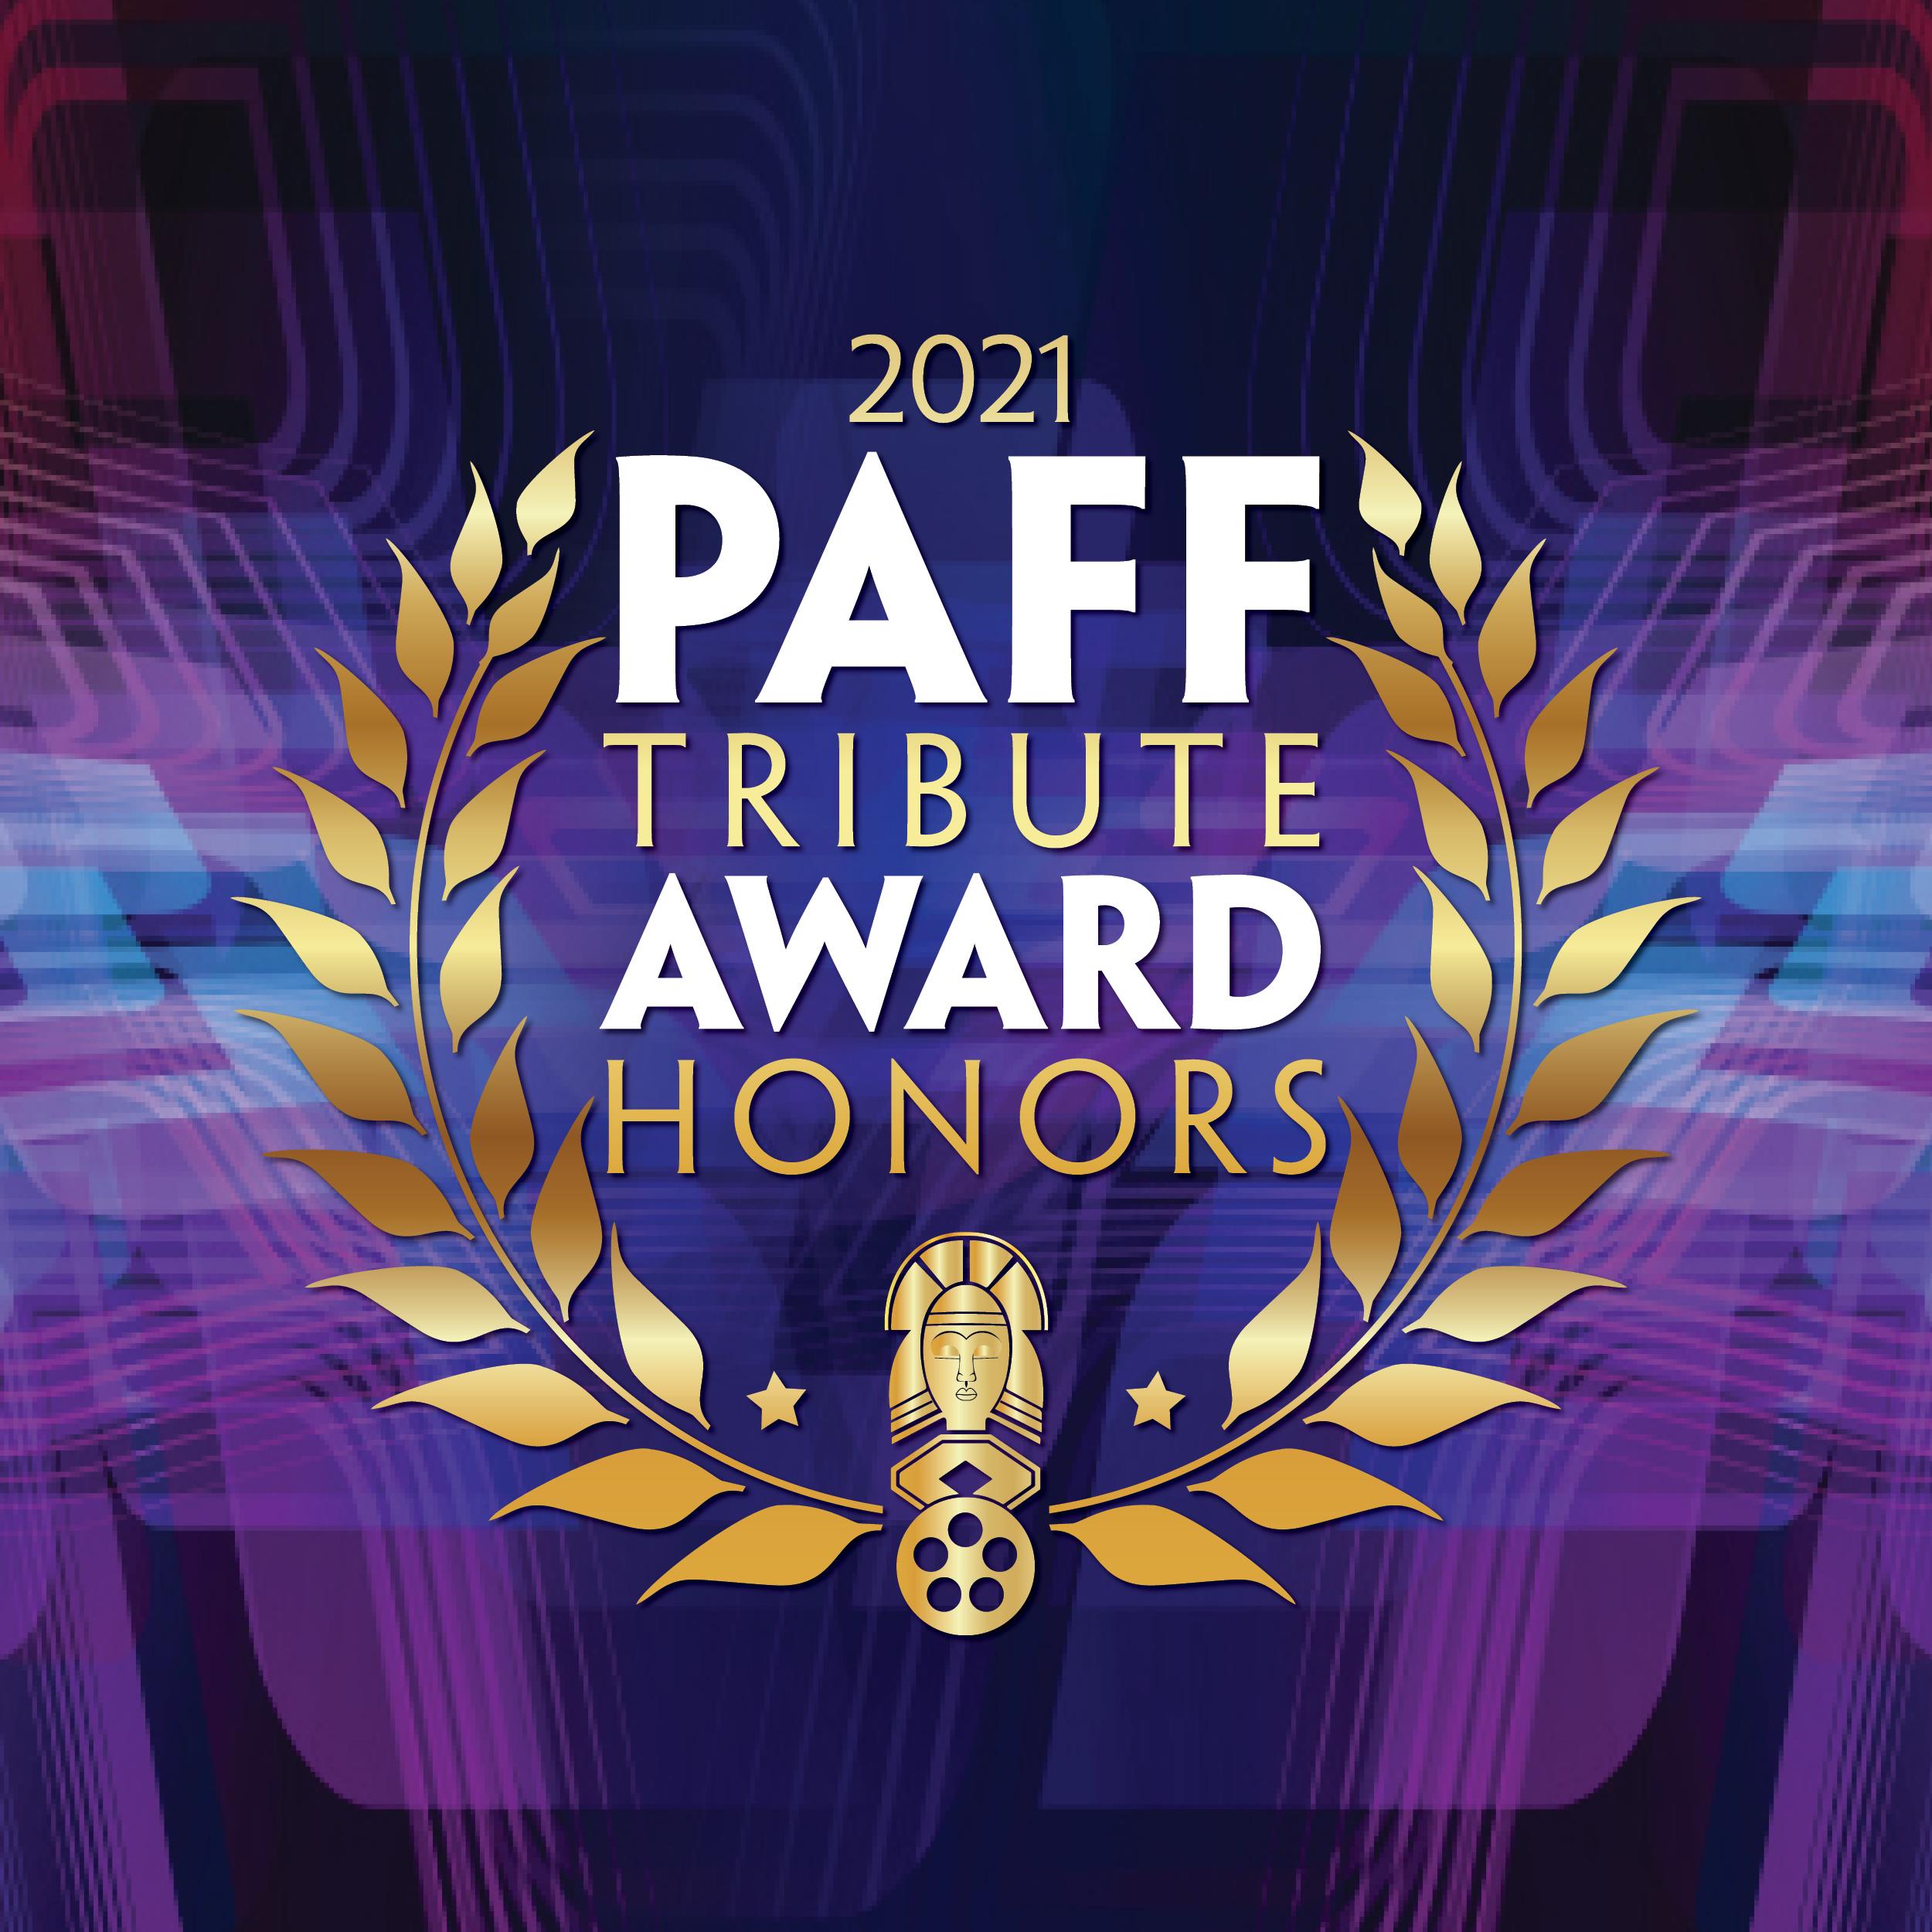 PAFF Awards